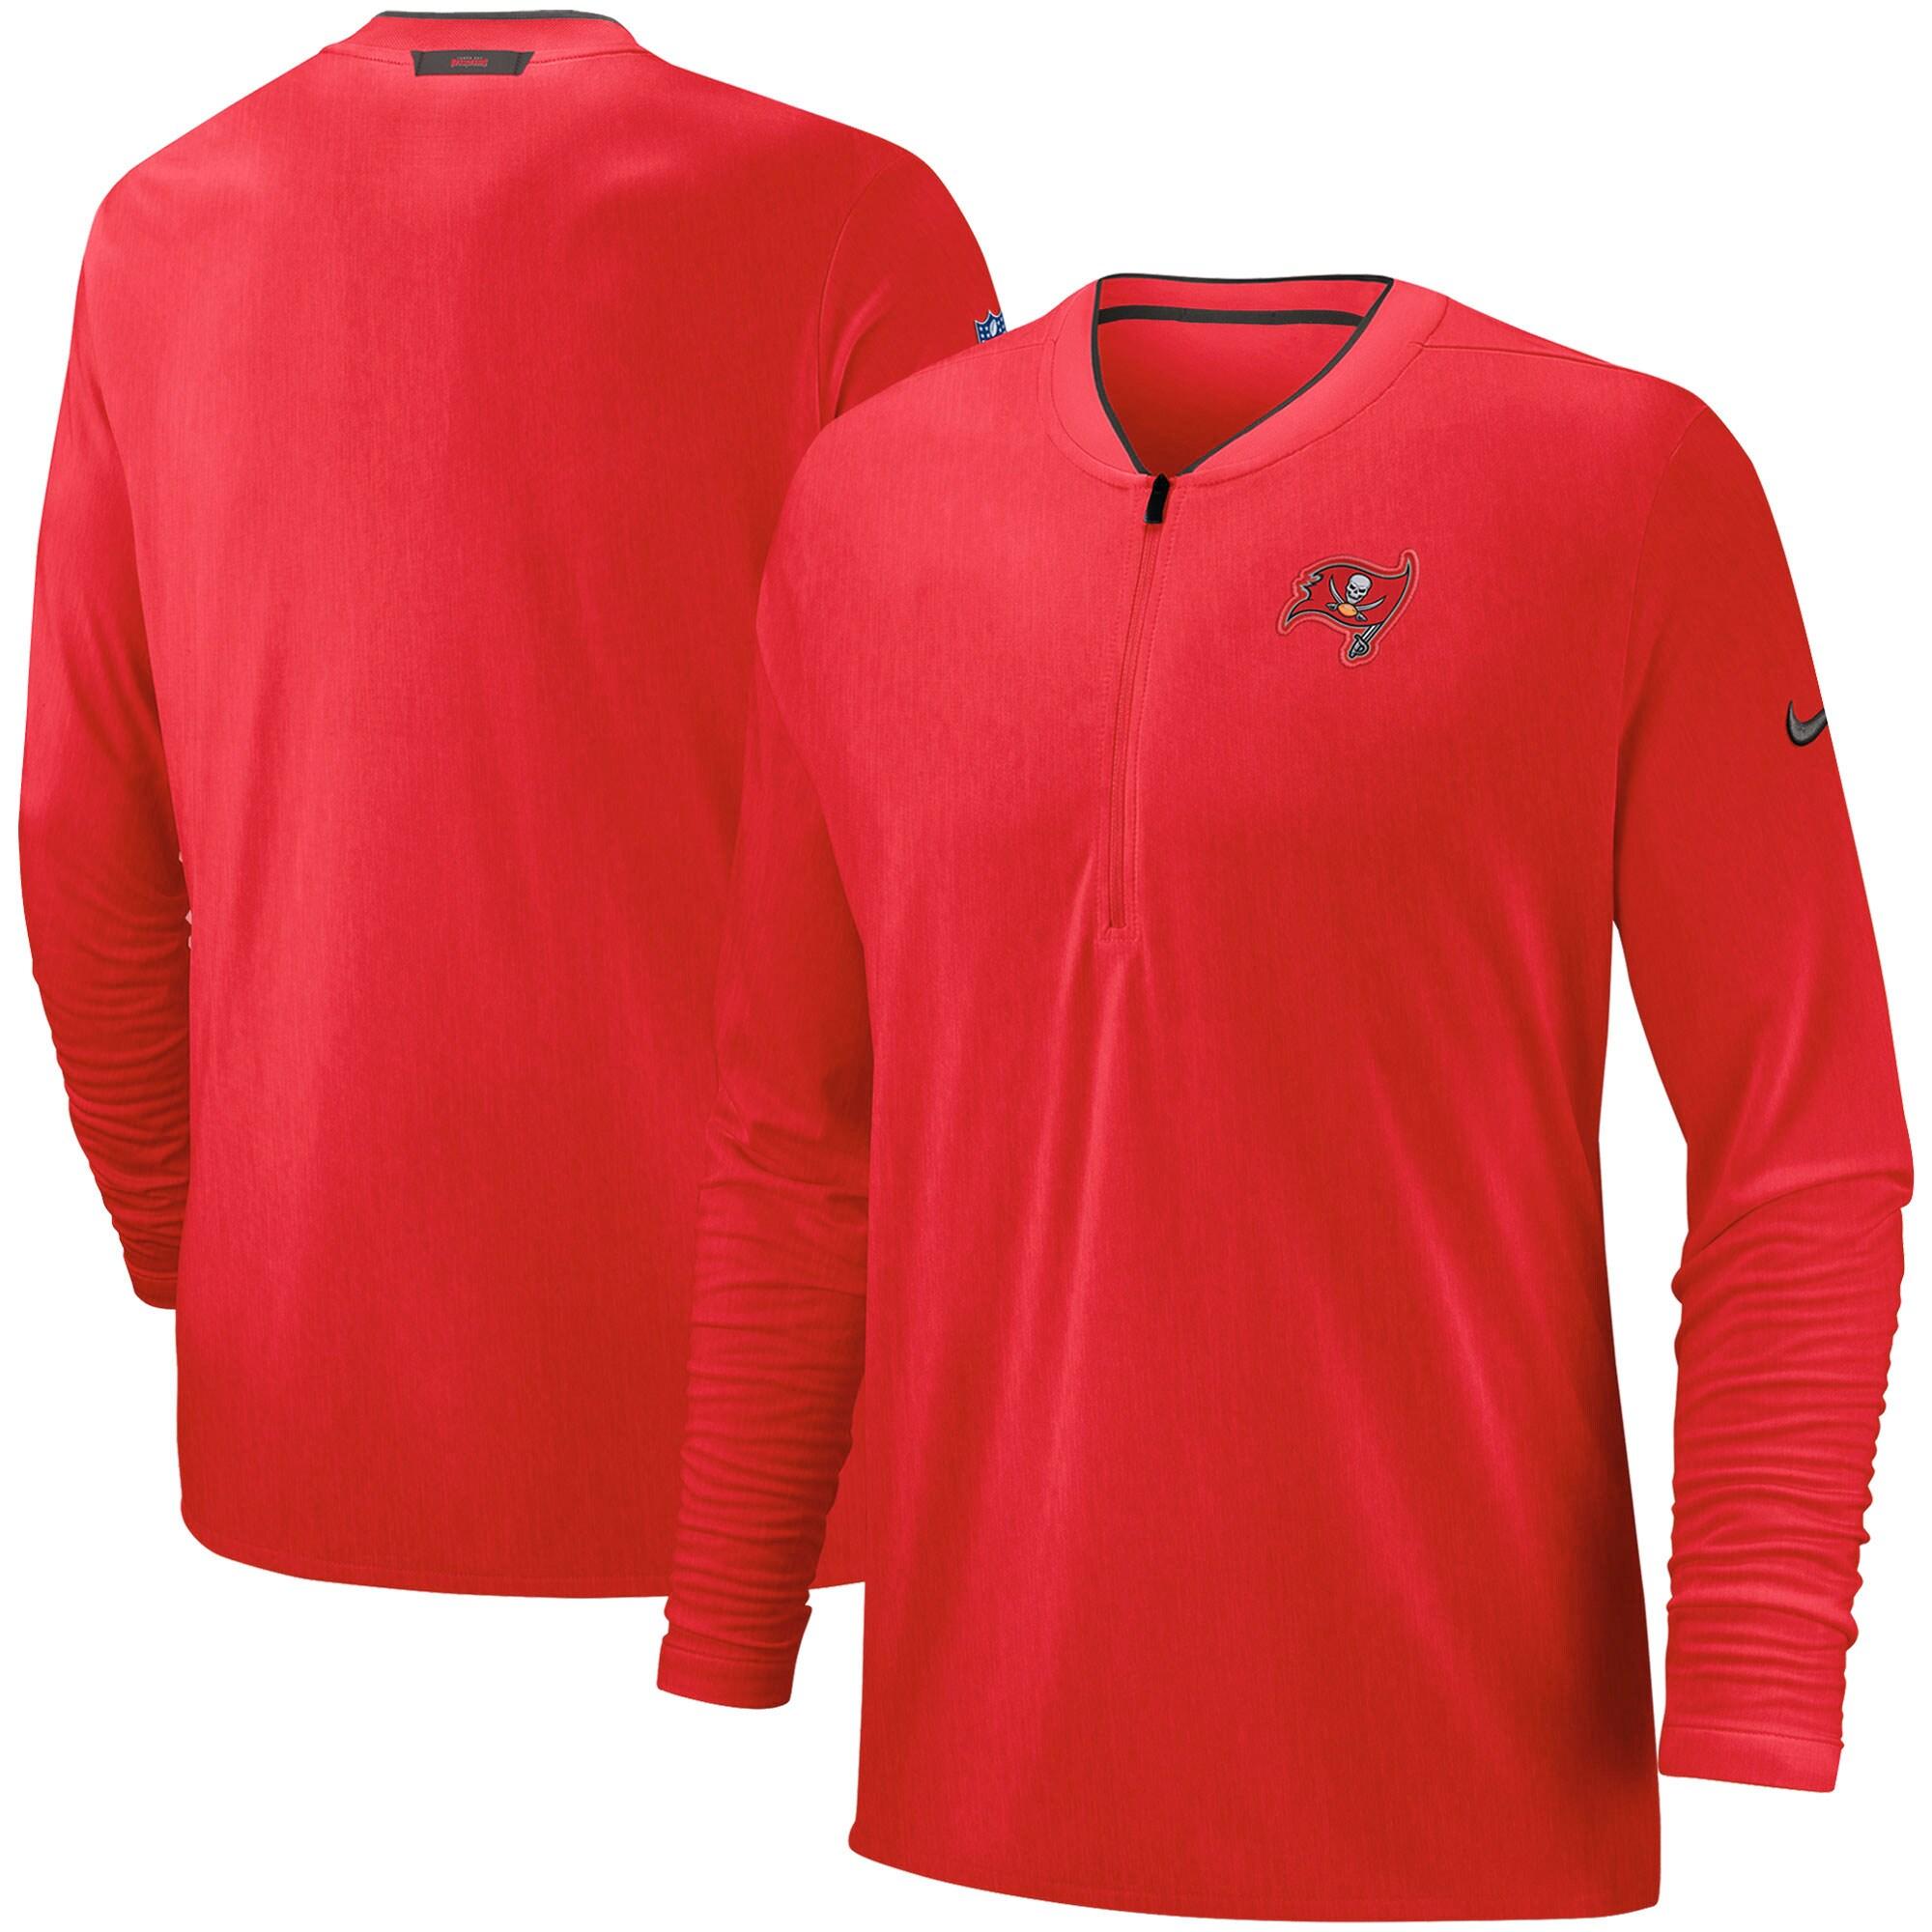 Tampa Bay Buccaneers Nike Sideline Coaches Half-Zip Pullover Jacket - Red